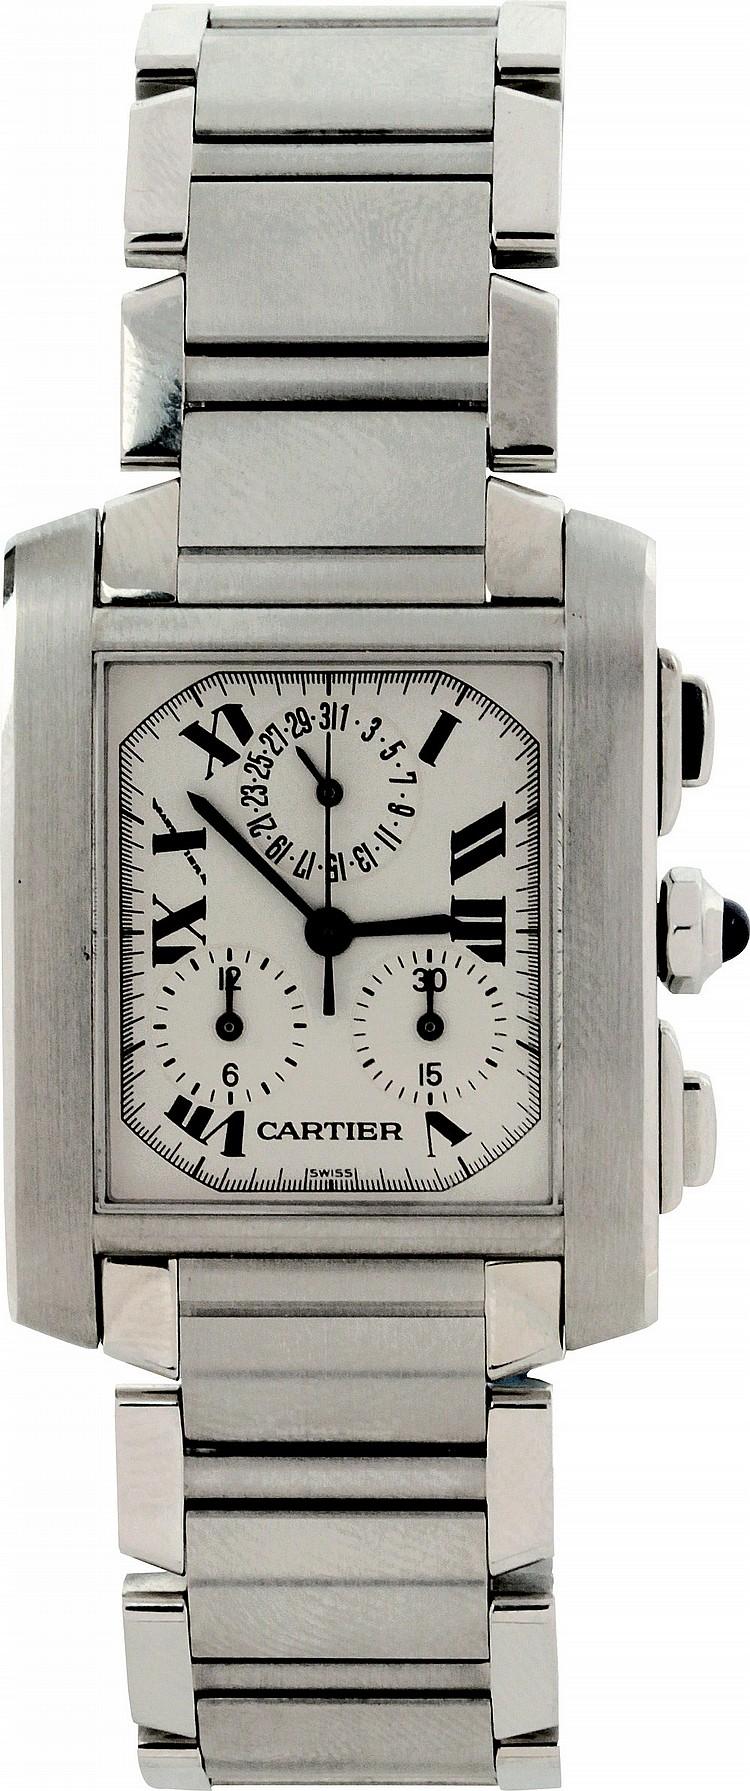 Cartier Tank Francaise Chrono Reflex, cronograph and calendar, ref. 2303